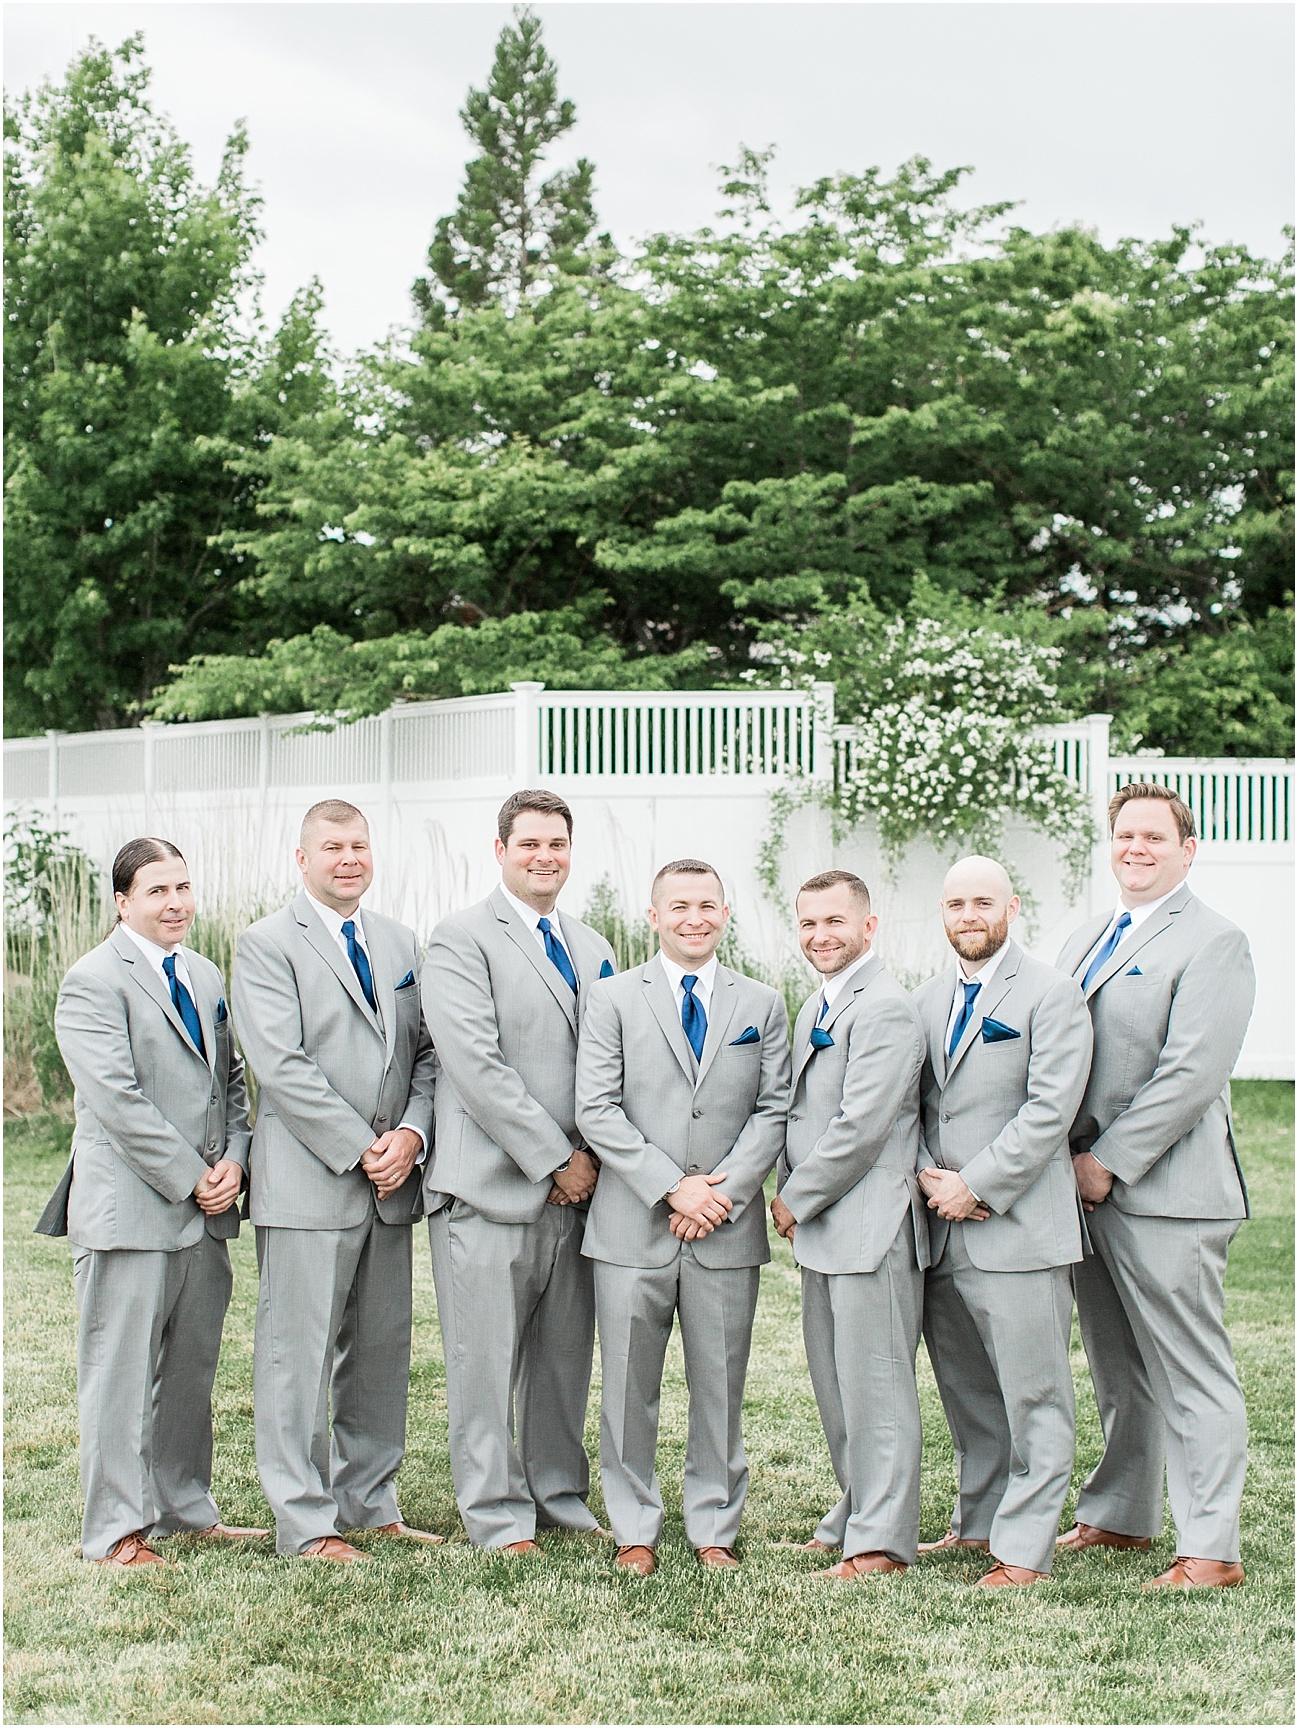 nicole_stephen_cape_club_nicky_falmouth_cod_boston_wedding_photographer_meredith_jane_photography_photo_0188.jpg